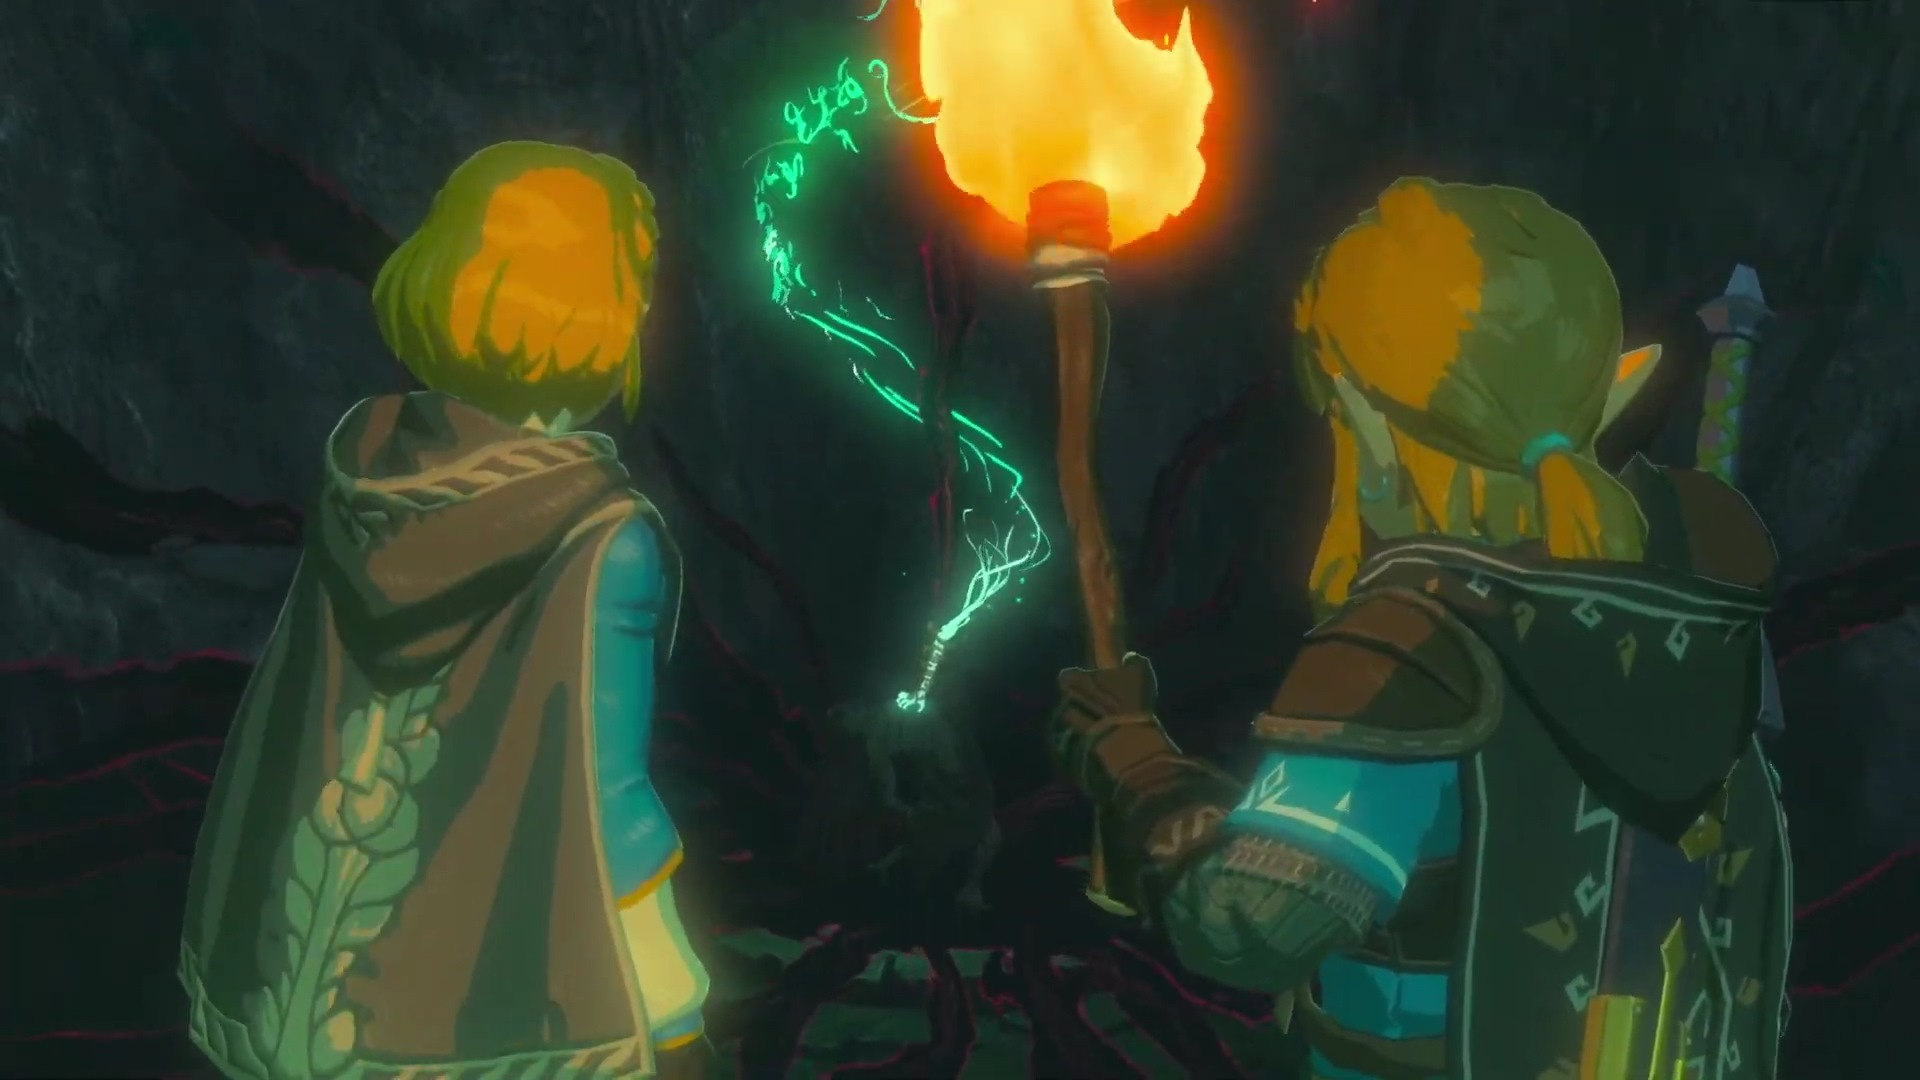 Nintendo teases 'Breath of the Wild' sequel, raising Zelda hype to new levels